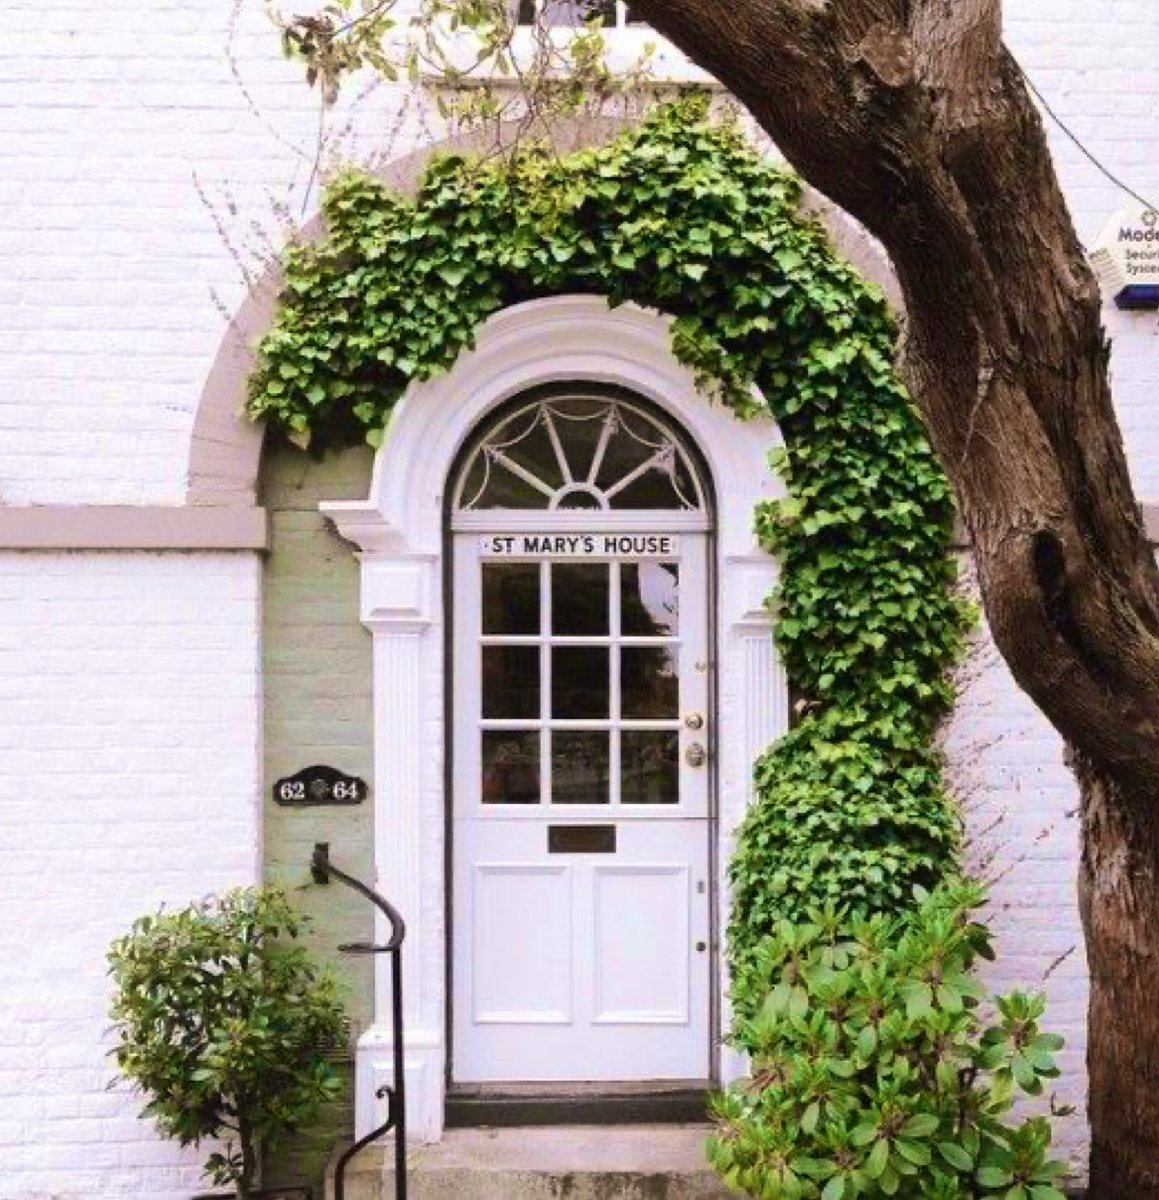 🏡🌿🍃🌿🍃🌿🏡 🚪@screenise(#UK🇬🇧) 🚪@Havenlust(Fitzwilliam Square #Dublin #Ireland🇮🇪) 🚪@Suchada60157220 🚪@moraimauy(#NYC #USA🇺🇸) #architecture #PlantATree #plants #tree #Green #door #window #Buildings #design #ideas #creative #nature #photograghy #beautiful #awesome #cool